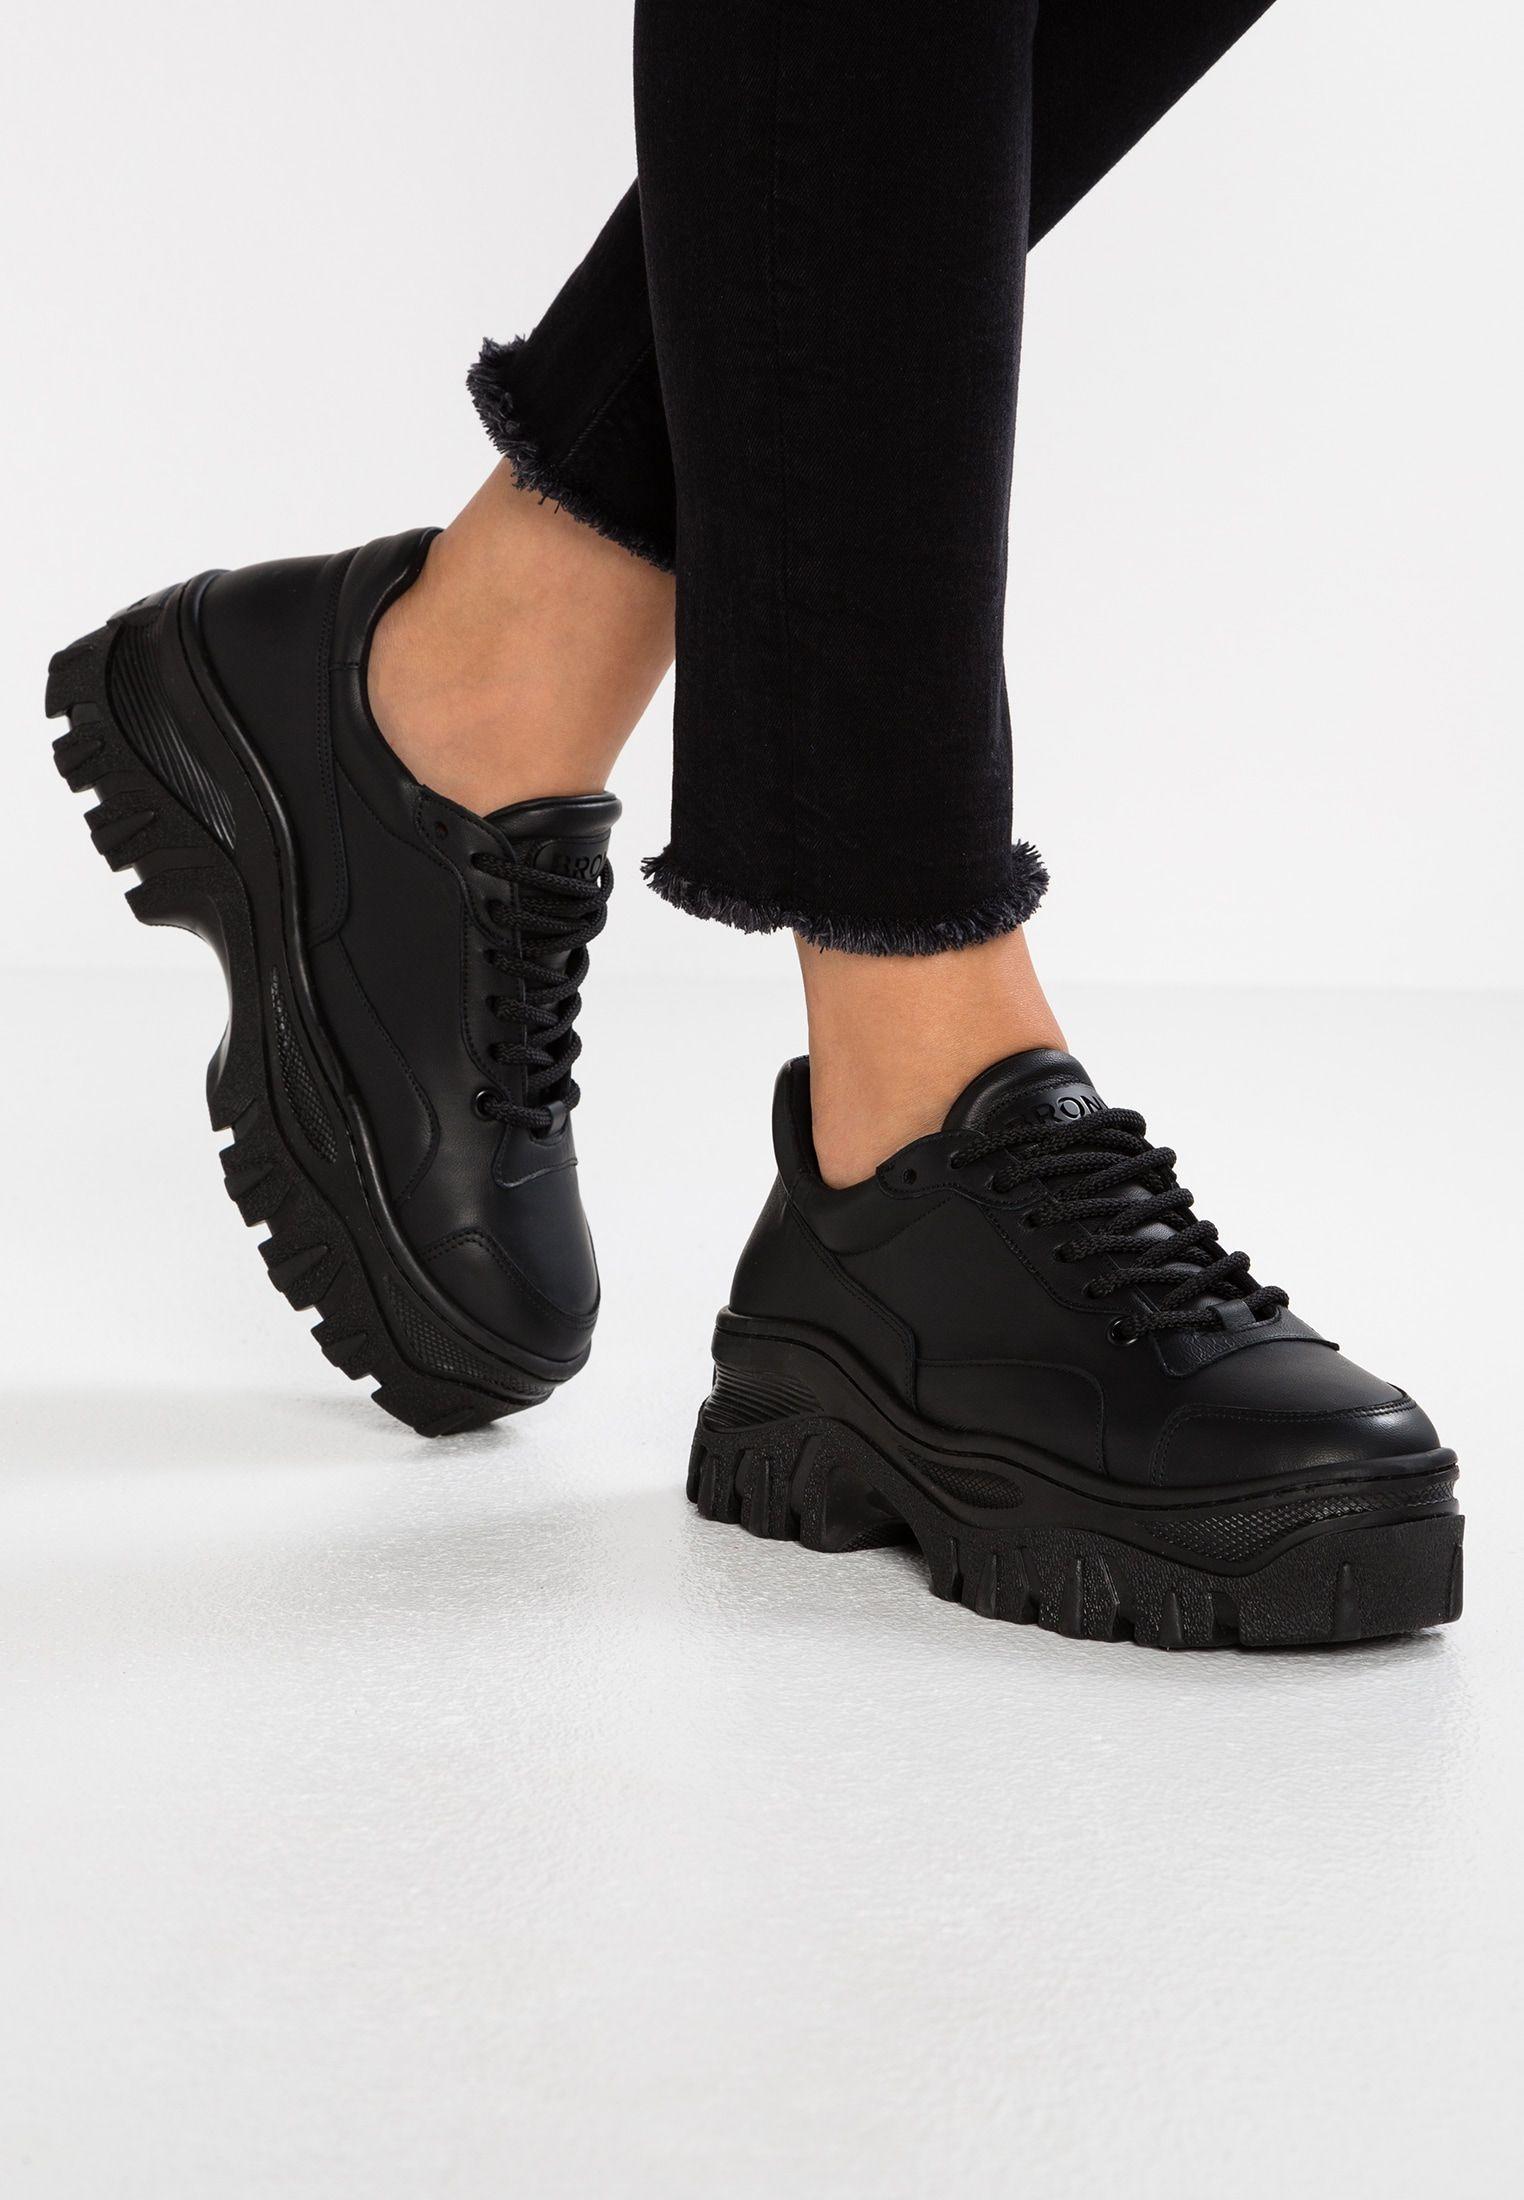 6ab7740dcc570 JAXSTAR - Joggesko - black @ Zalando.no 🛒 | Wishlist | Bronx shoes ...